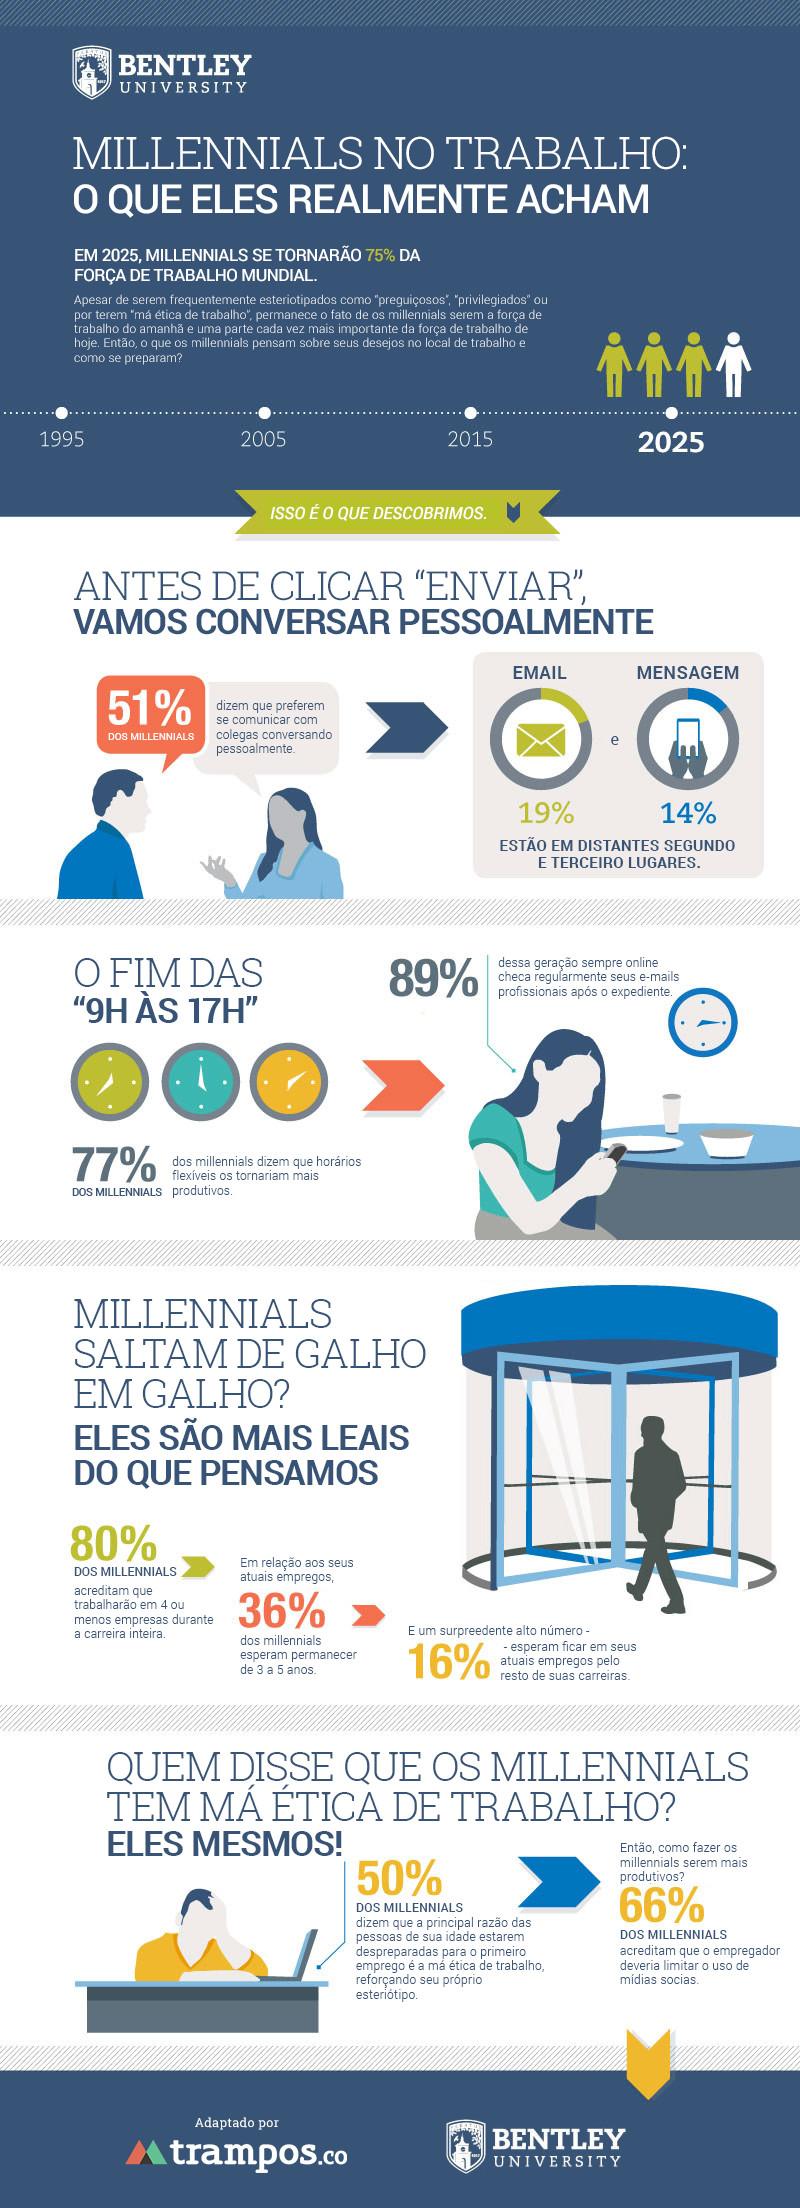 2016-05-30_millennials_no_trabalho